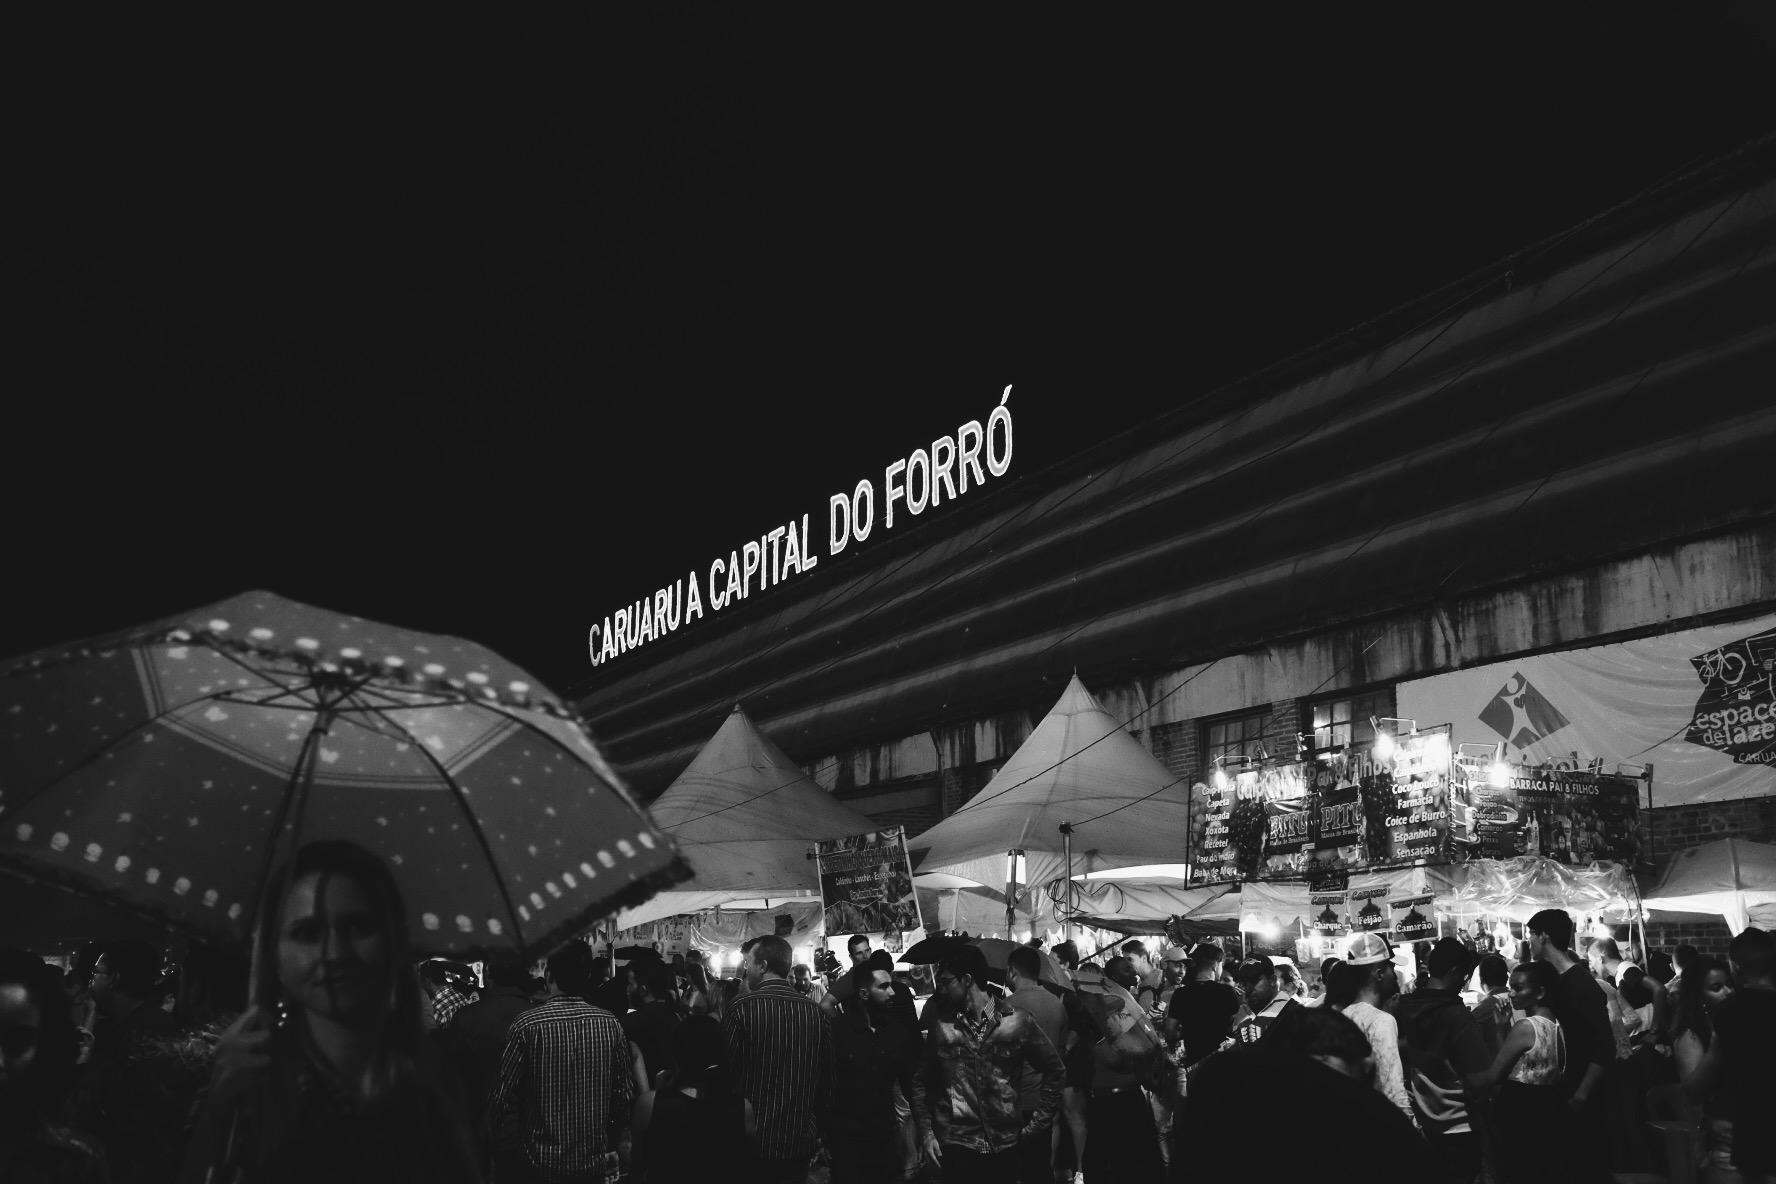 Caruaru a Capital do Forró!